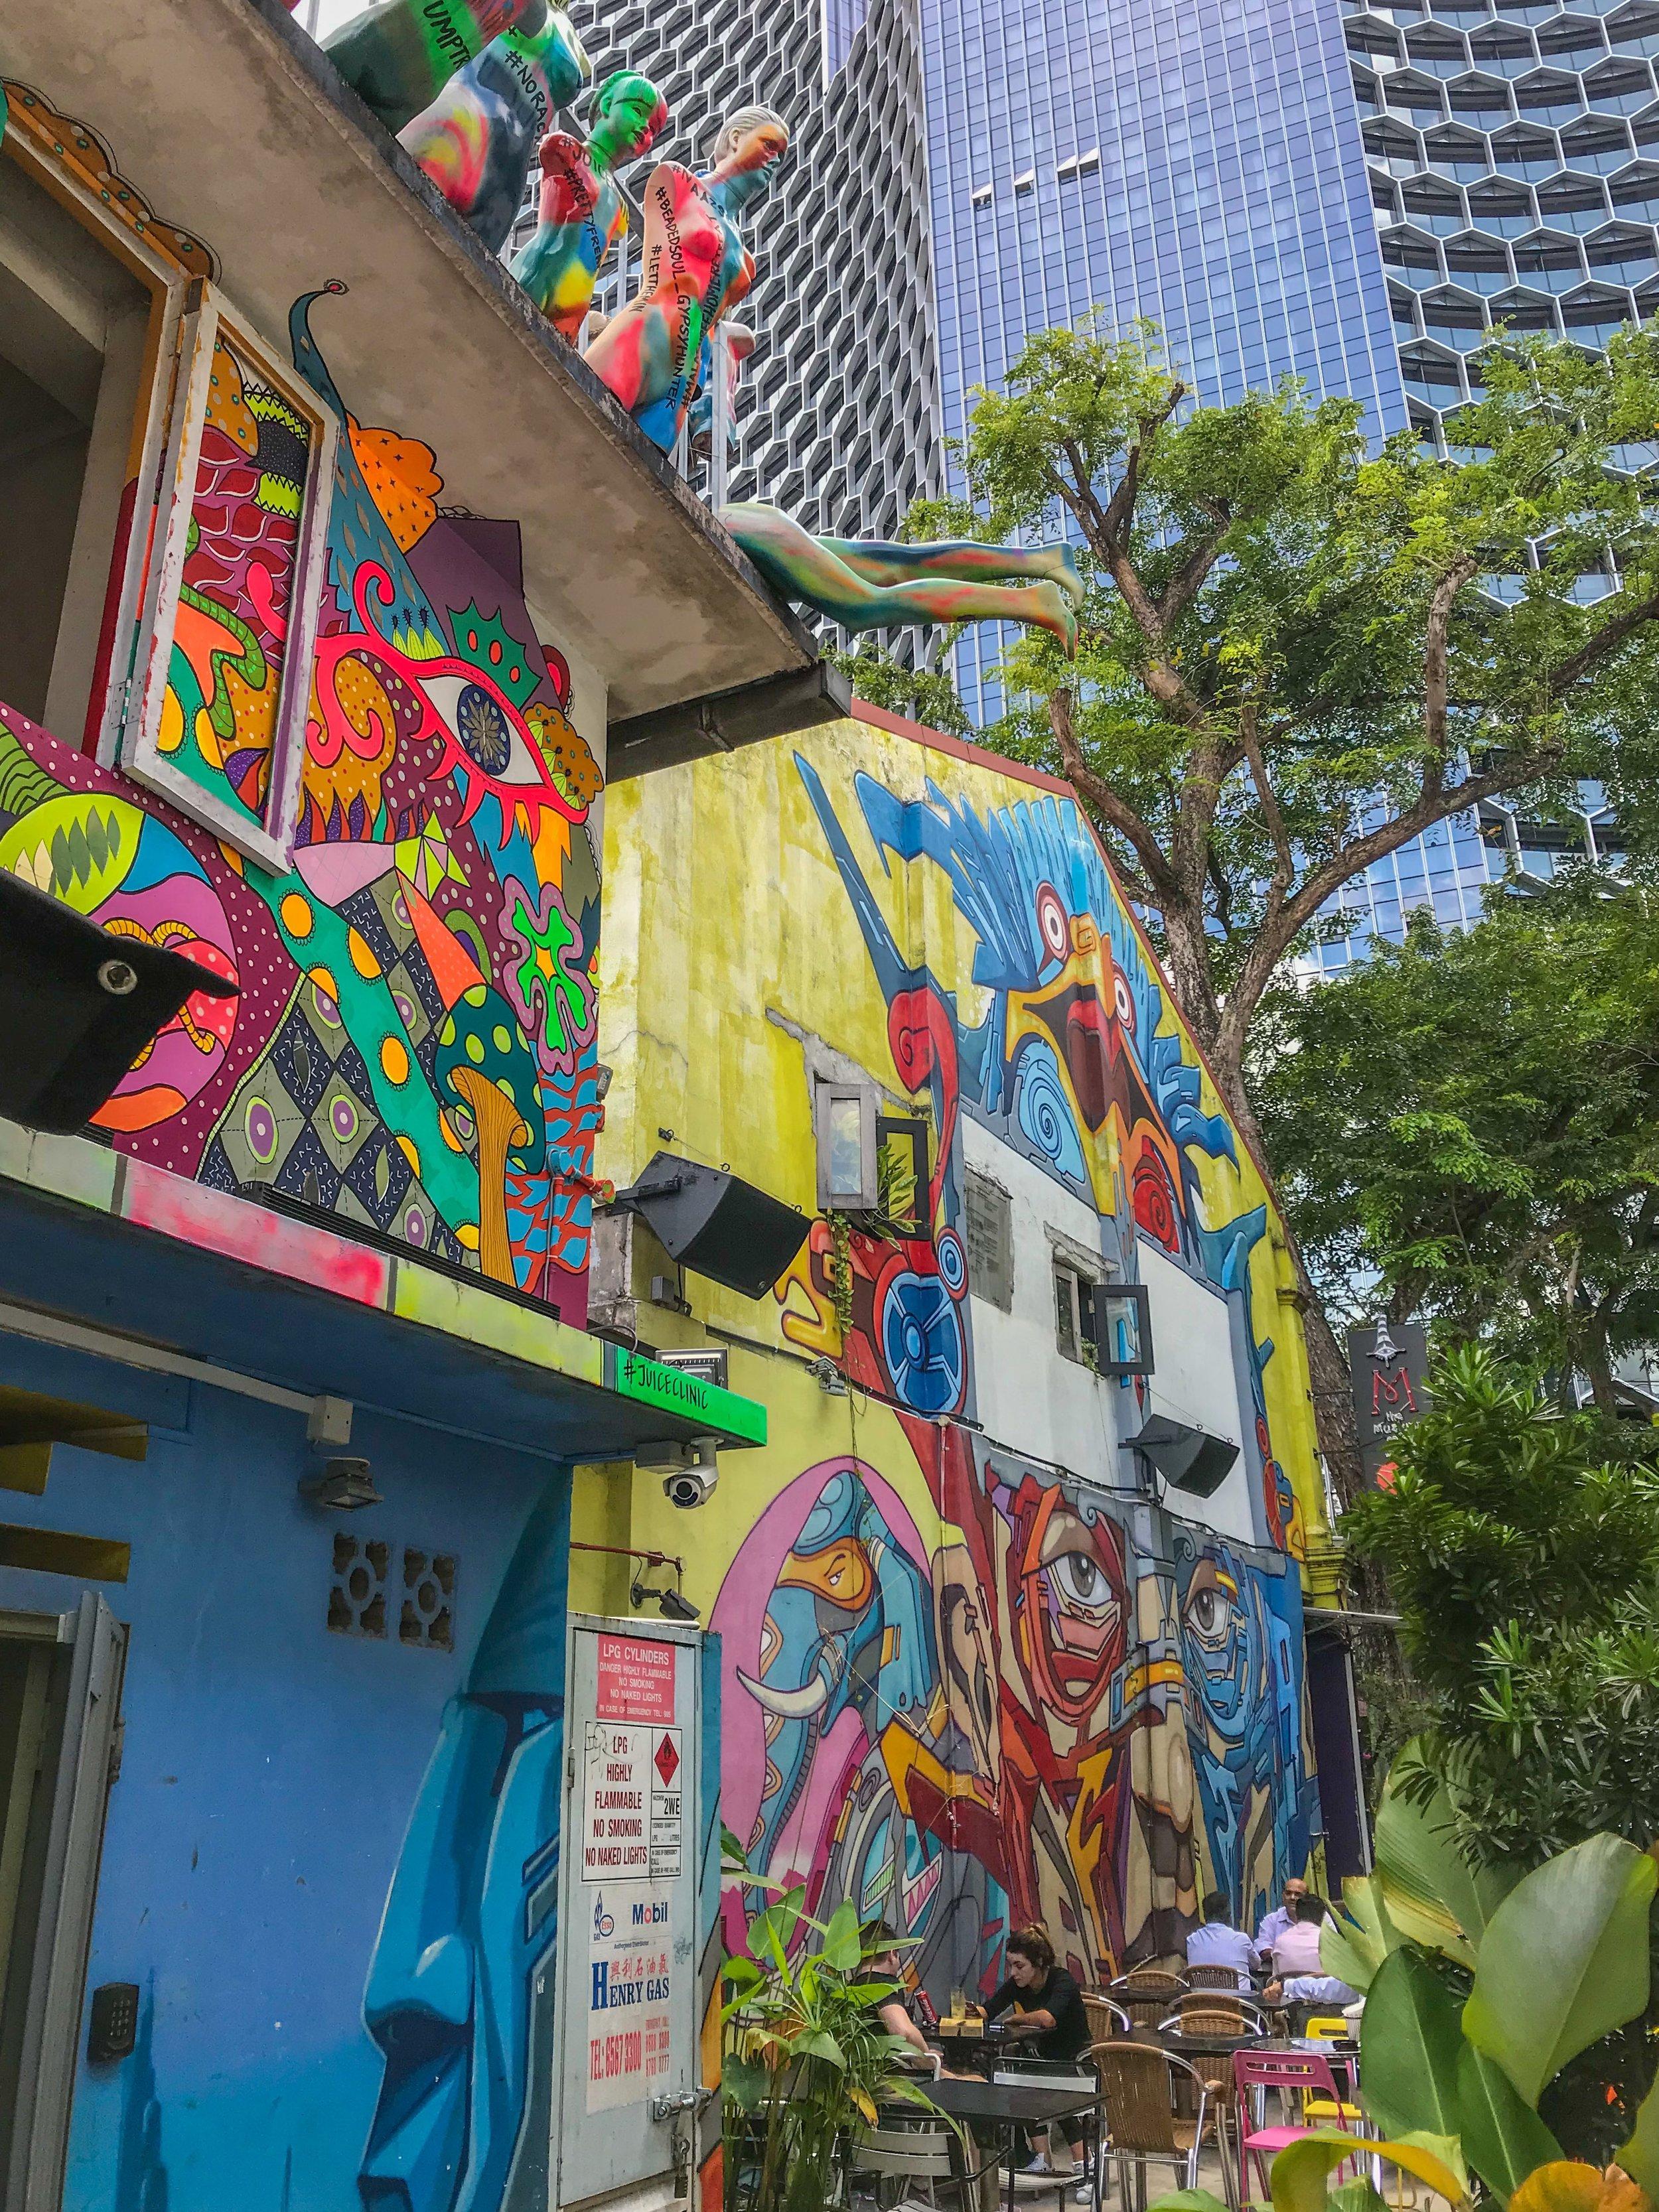 Street art in Kampong Glam